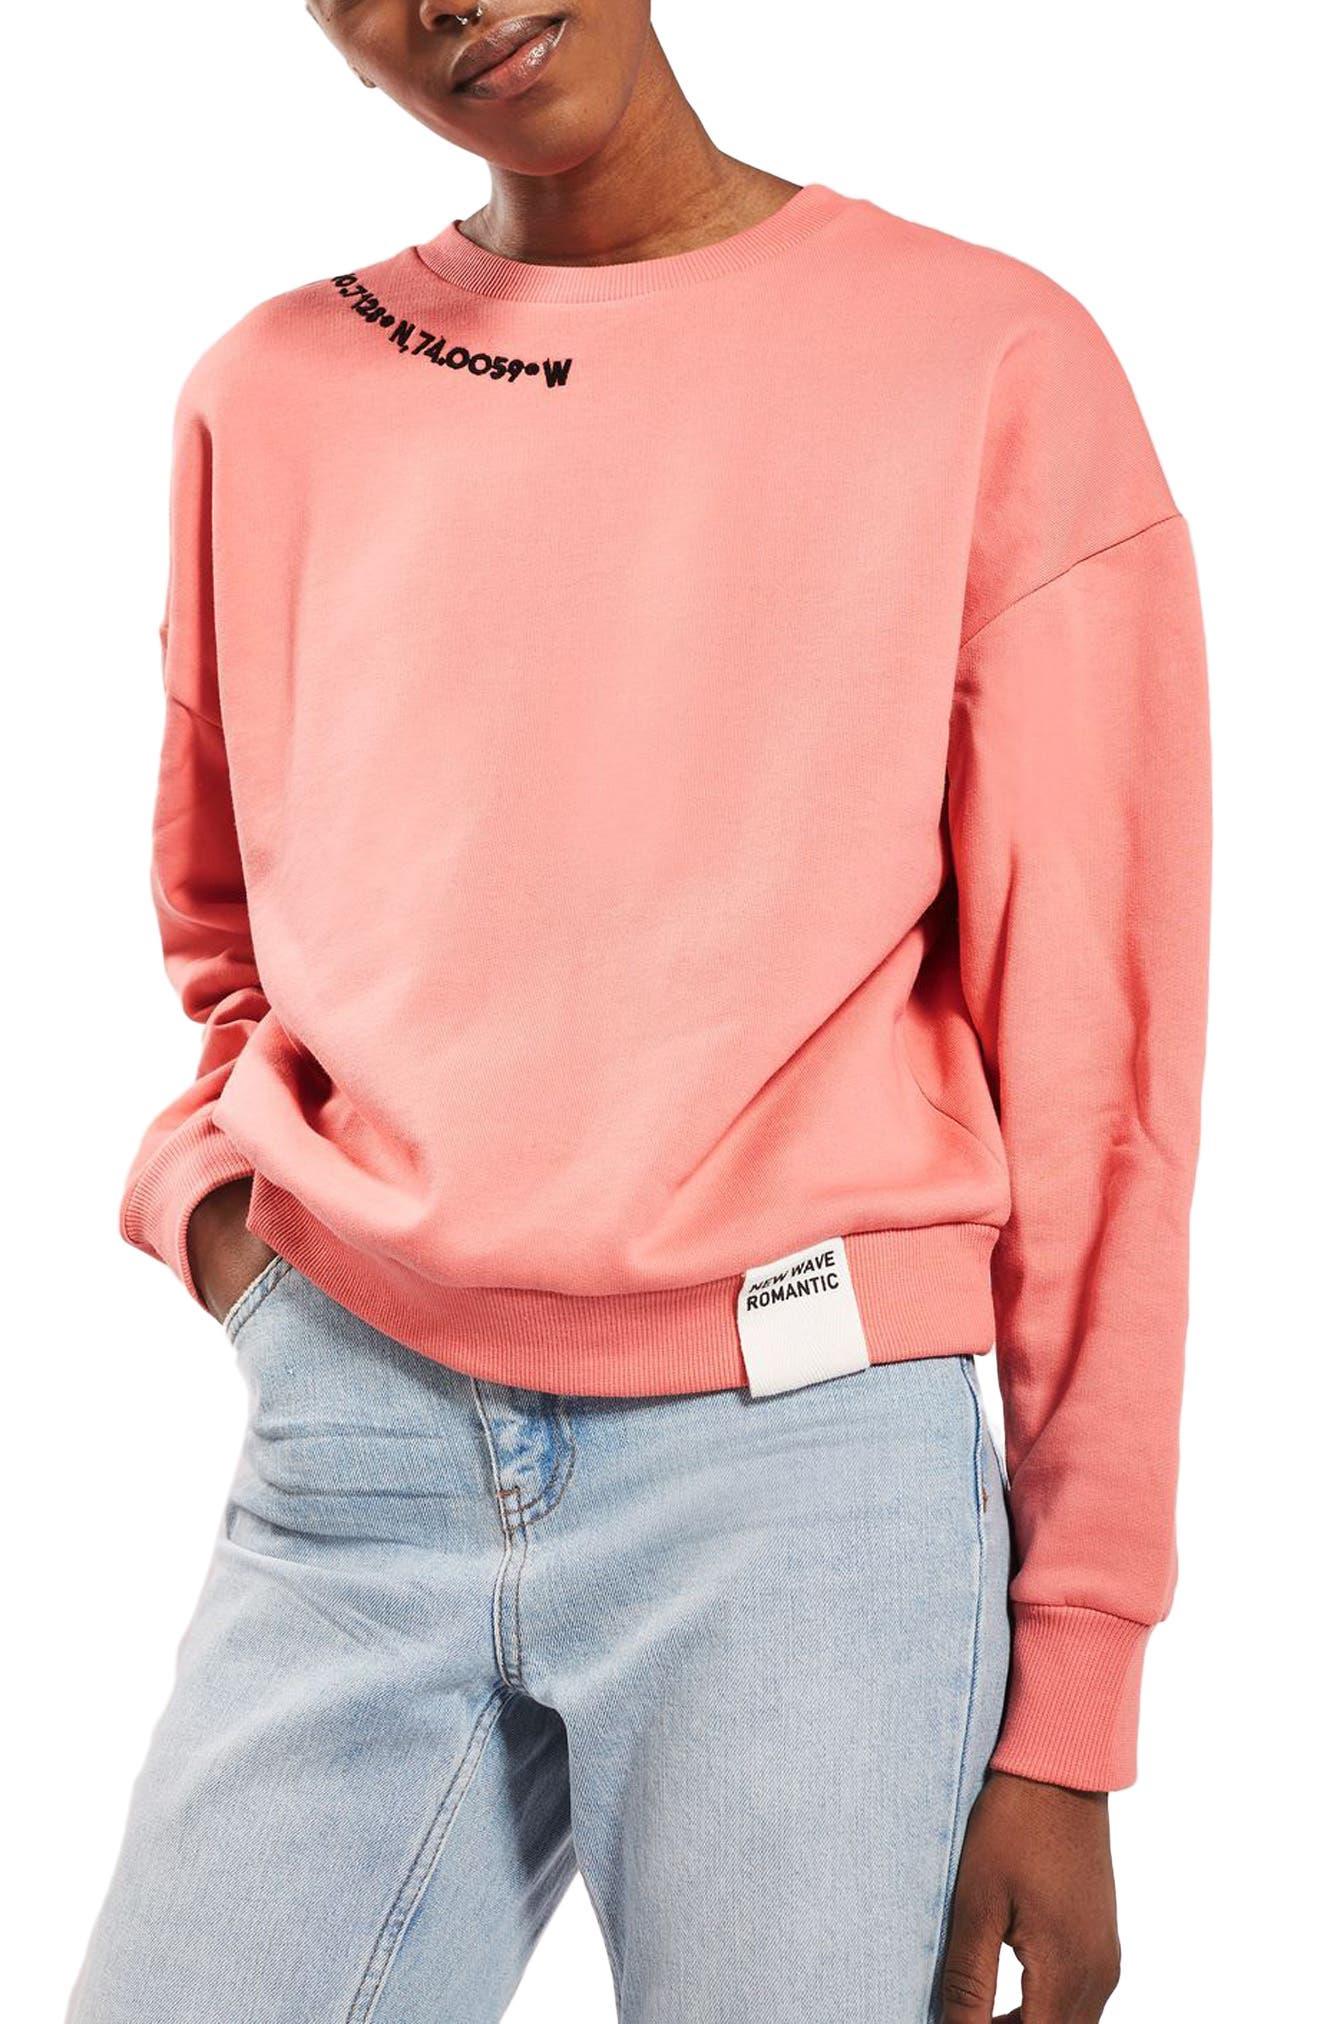 Alternate Image 1 Selected - Topshop Romance Sweatshirt